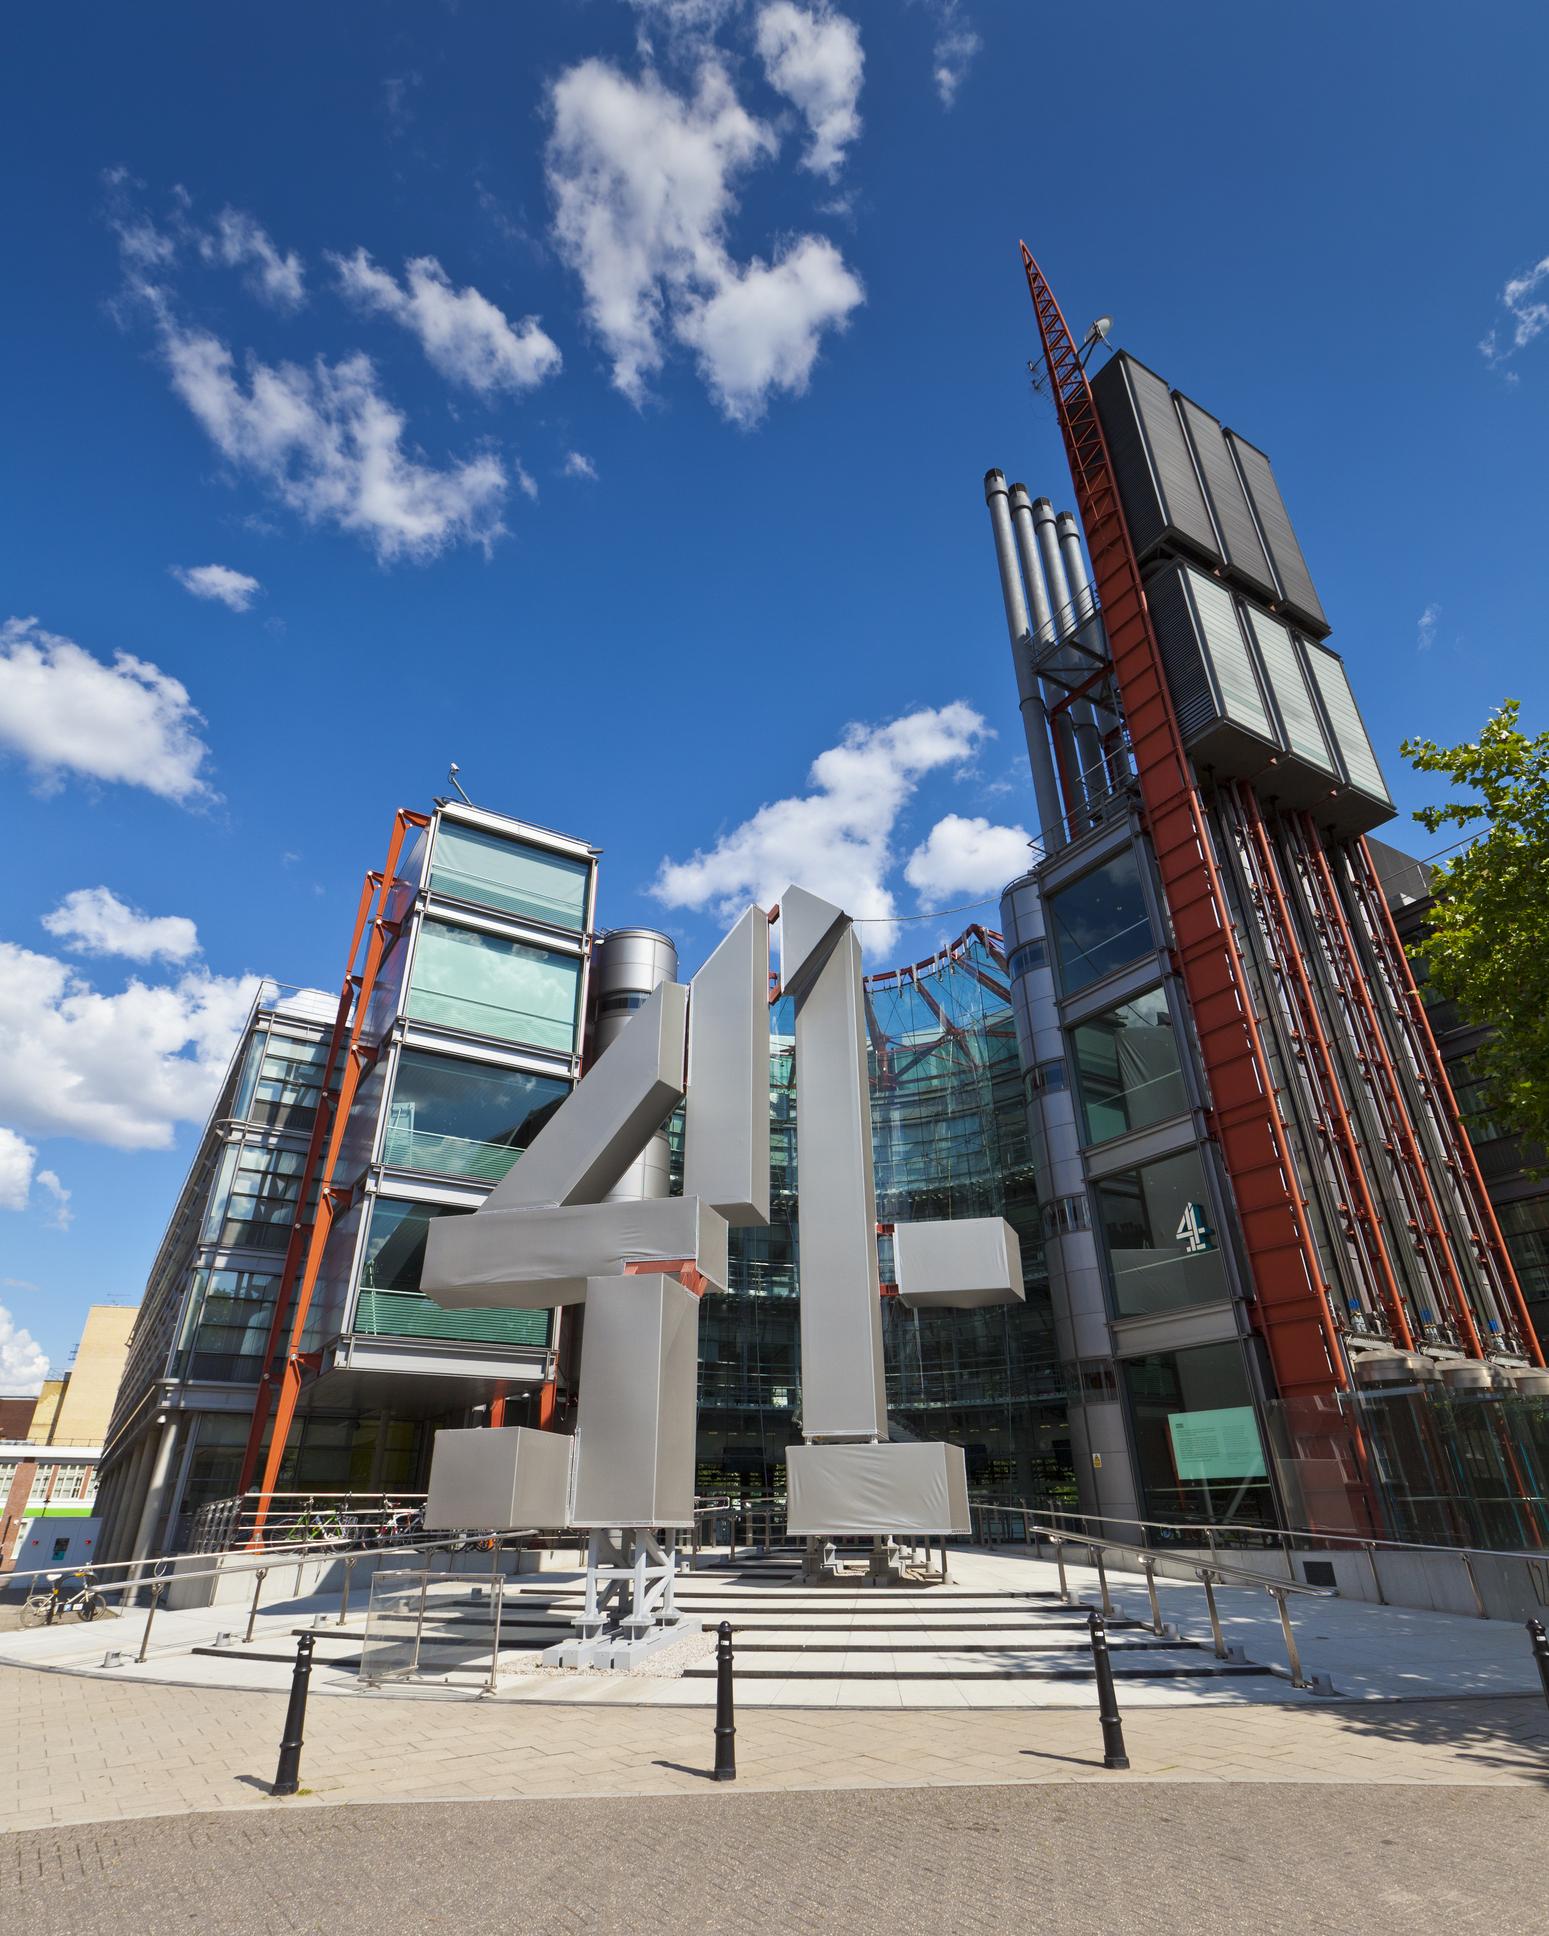 Channel Four Headquarters, London, UK